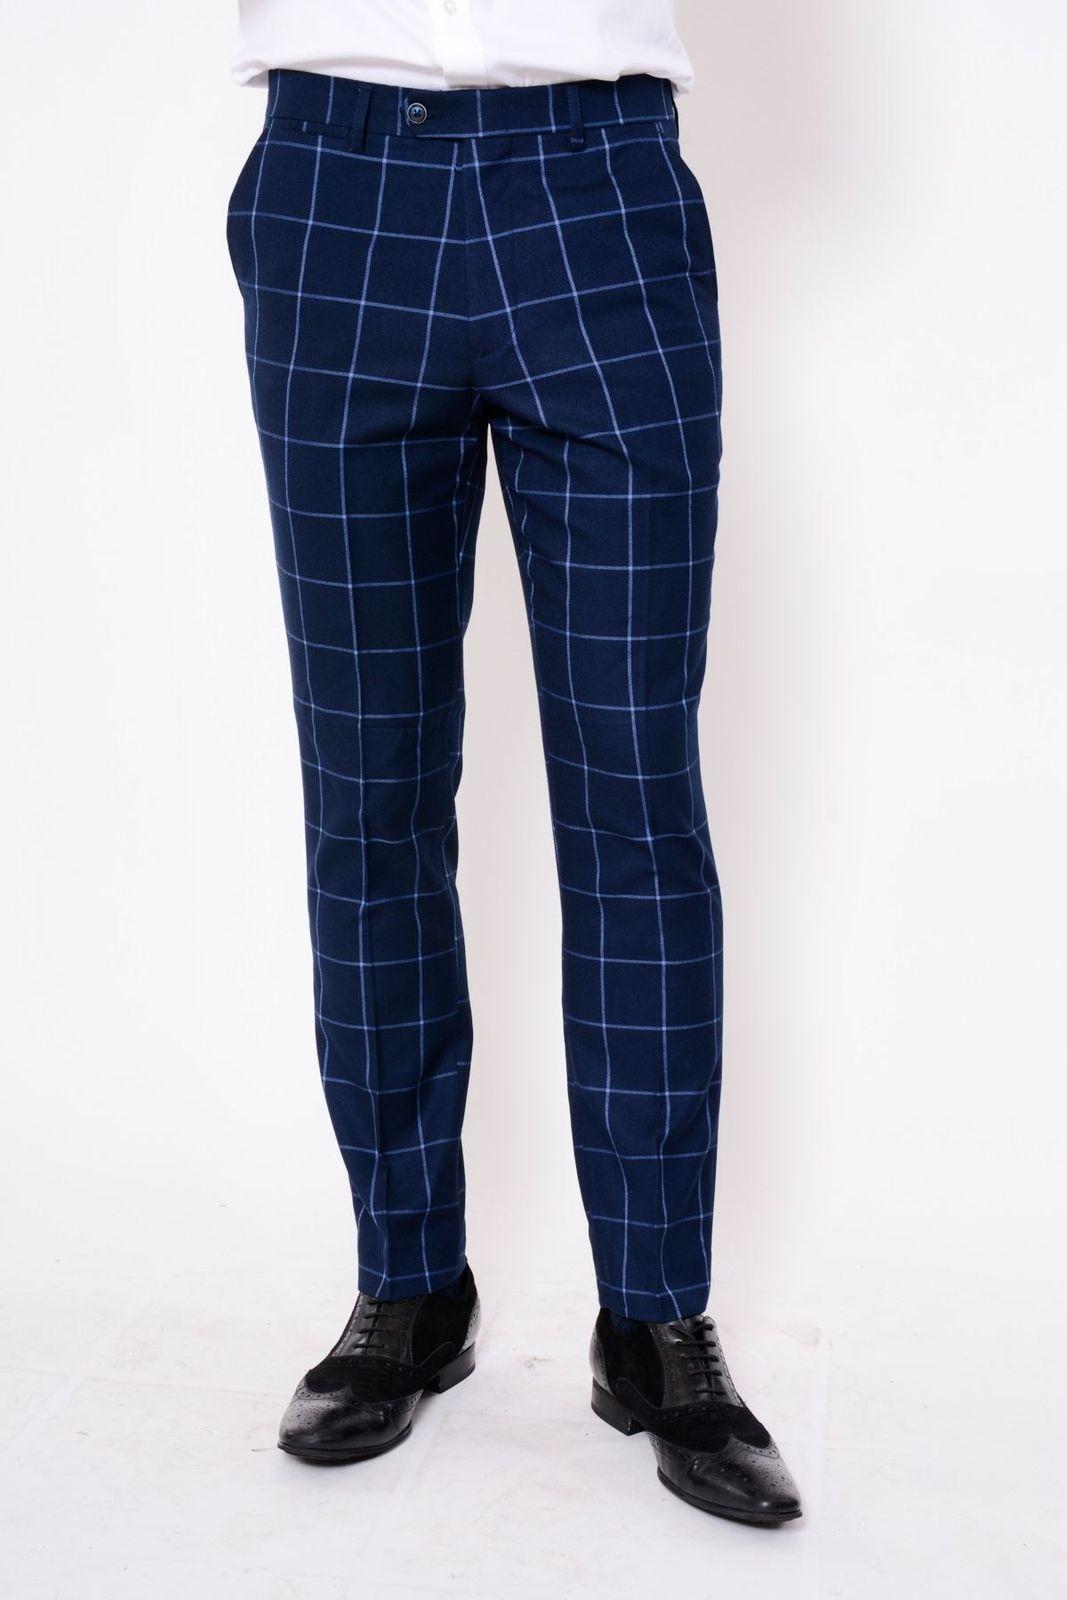 Hommes Marc Darcy Navy Tweed Pantalon carreaux Tailored Slim Smart Pantalon